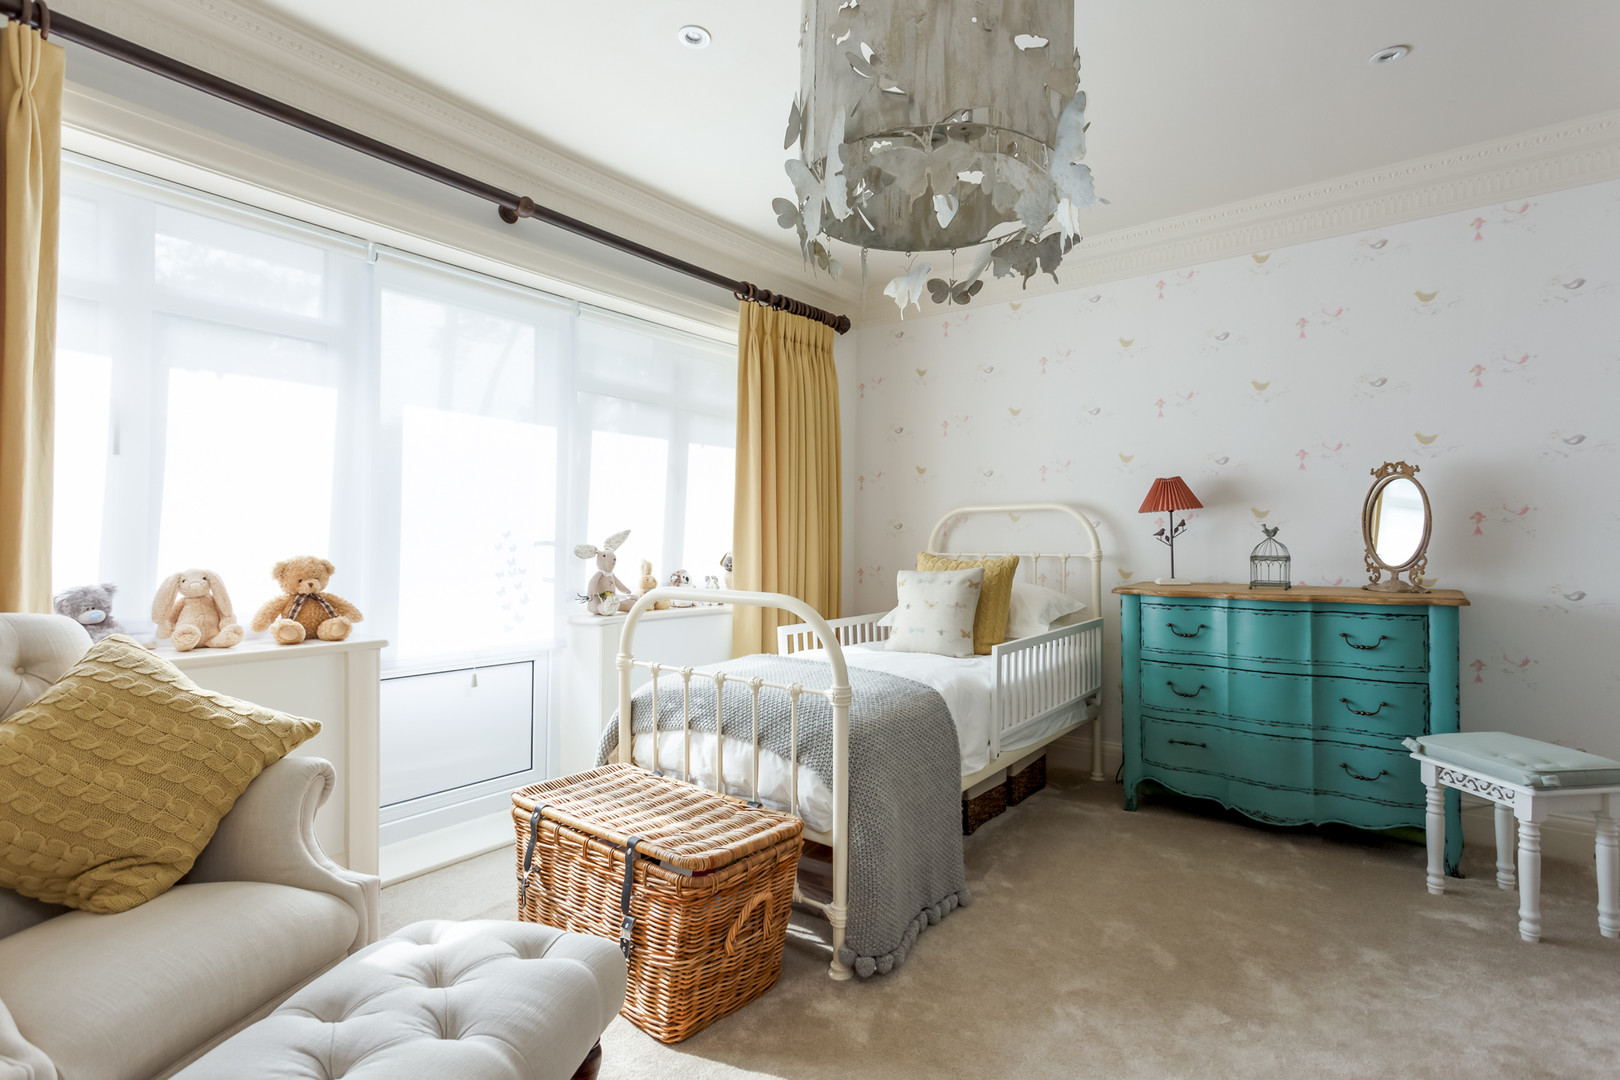 Girls interior designed bedroom_web.jpg